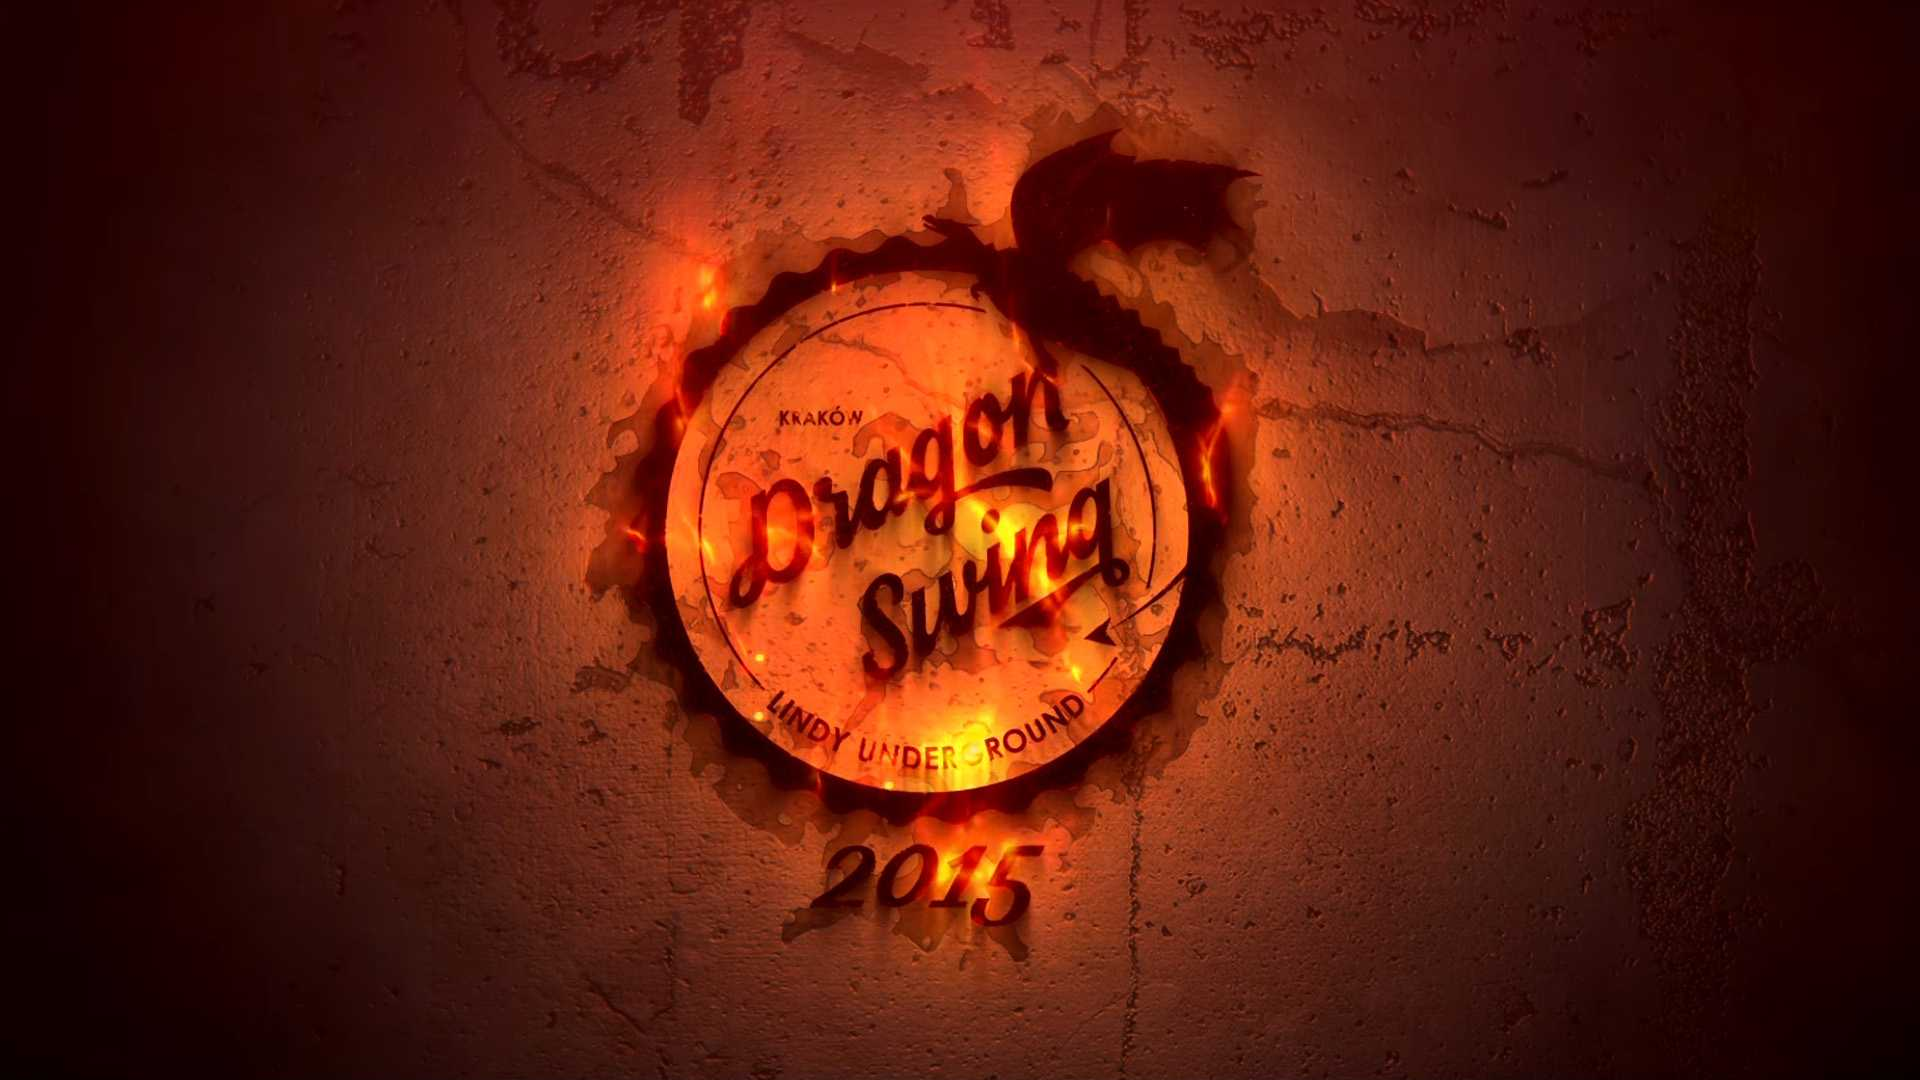 Dragon Swing 2015: Lindy Underground